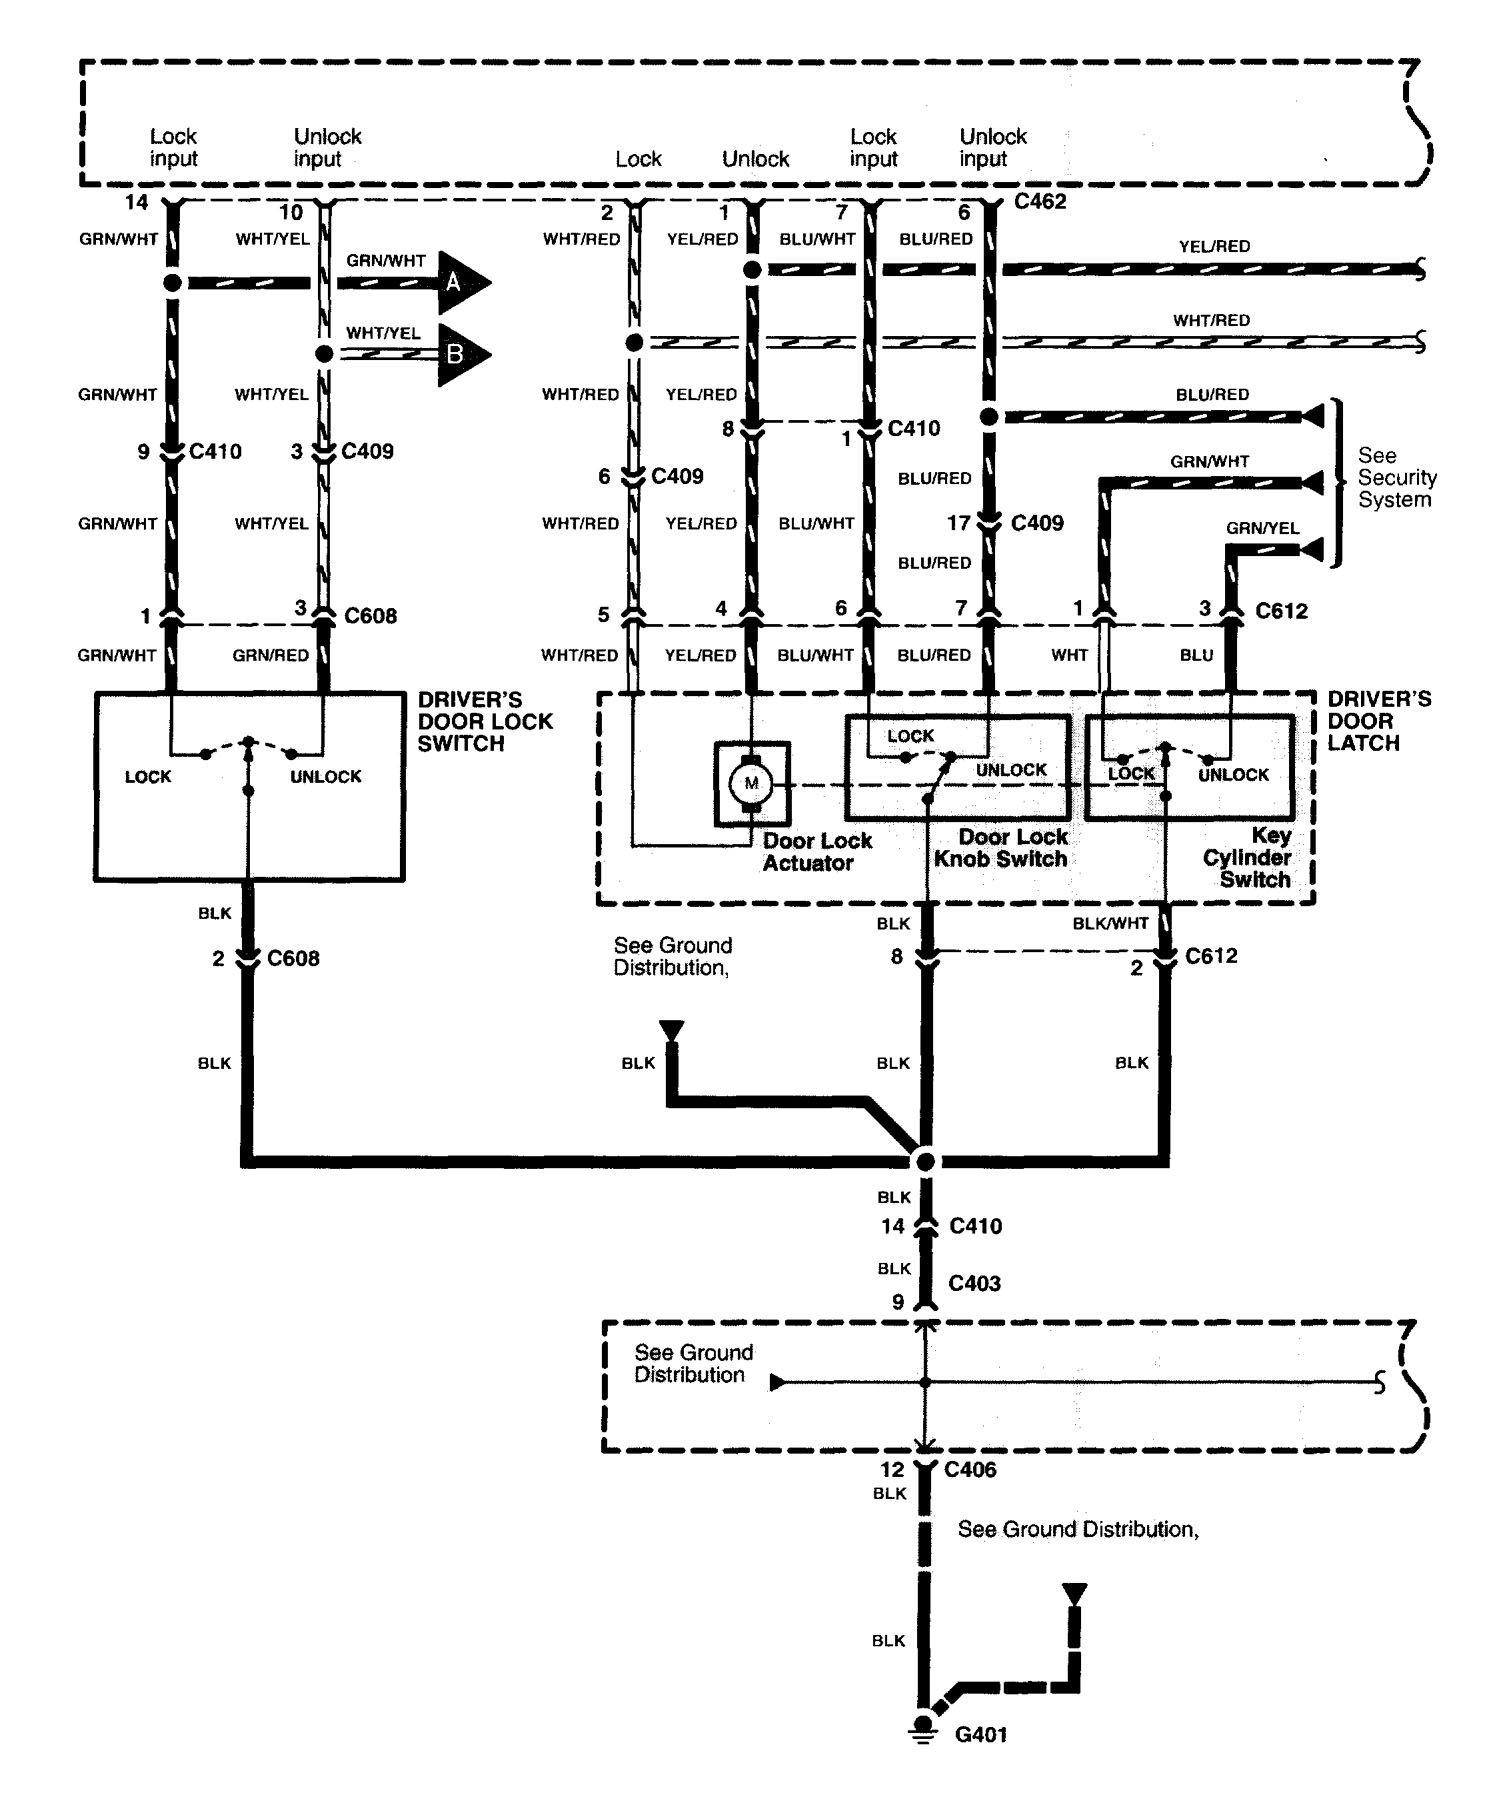 2001 western star wiring diagrams